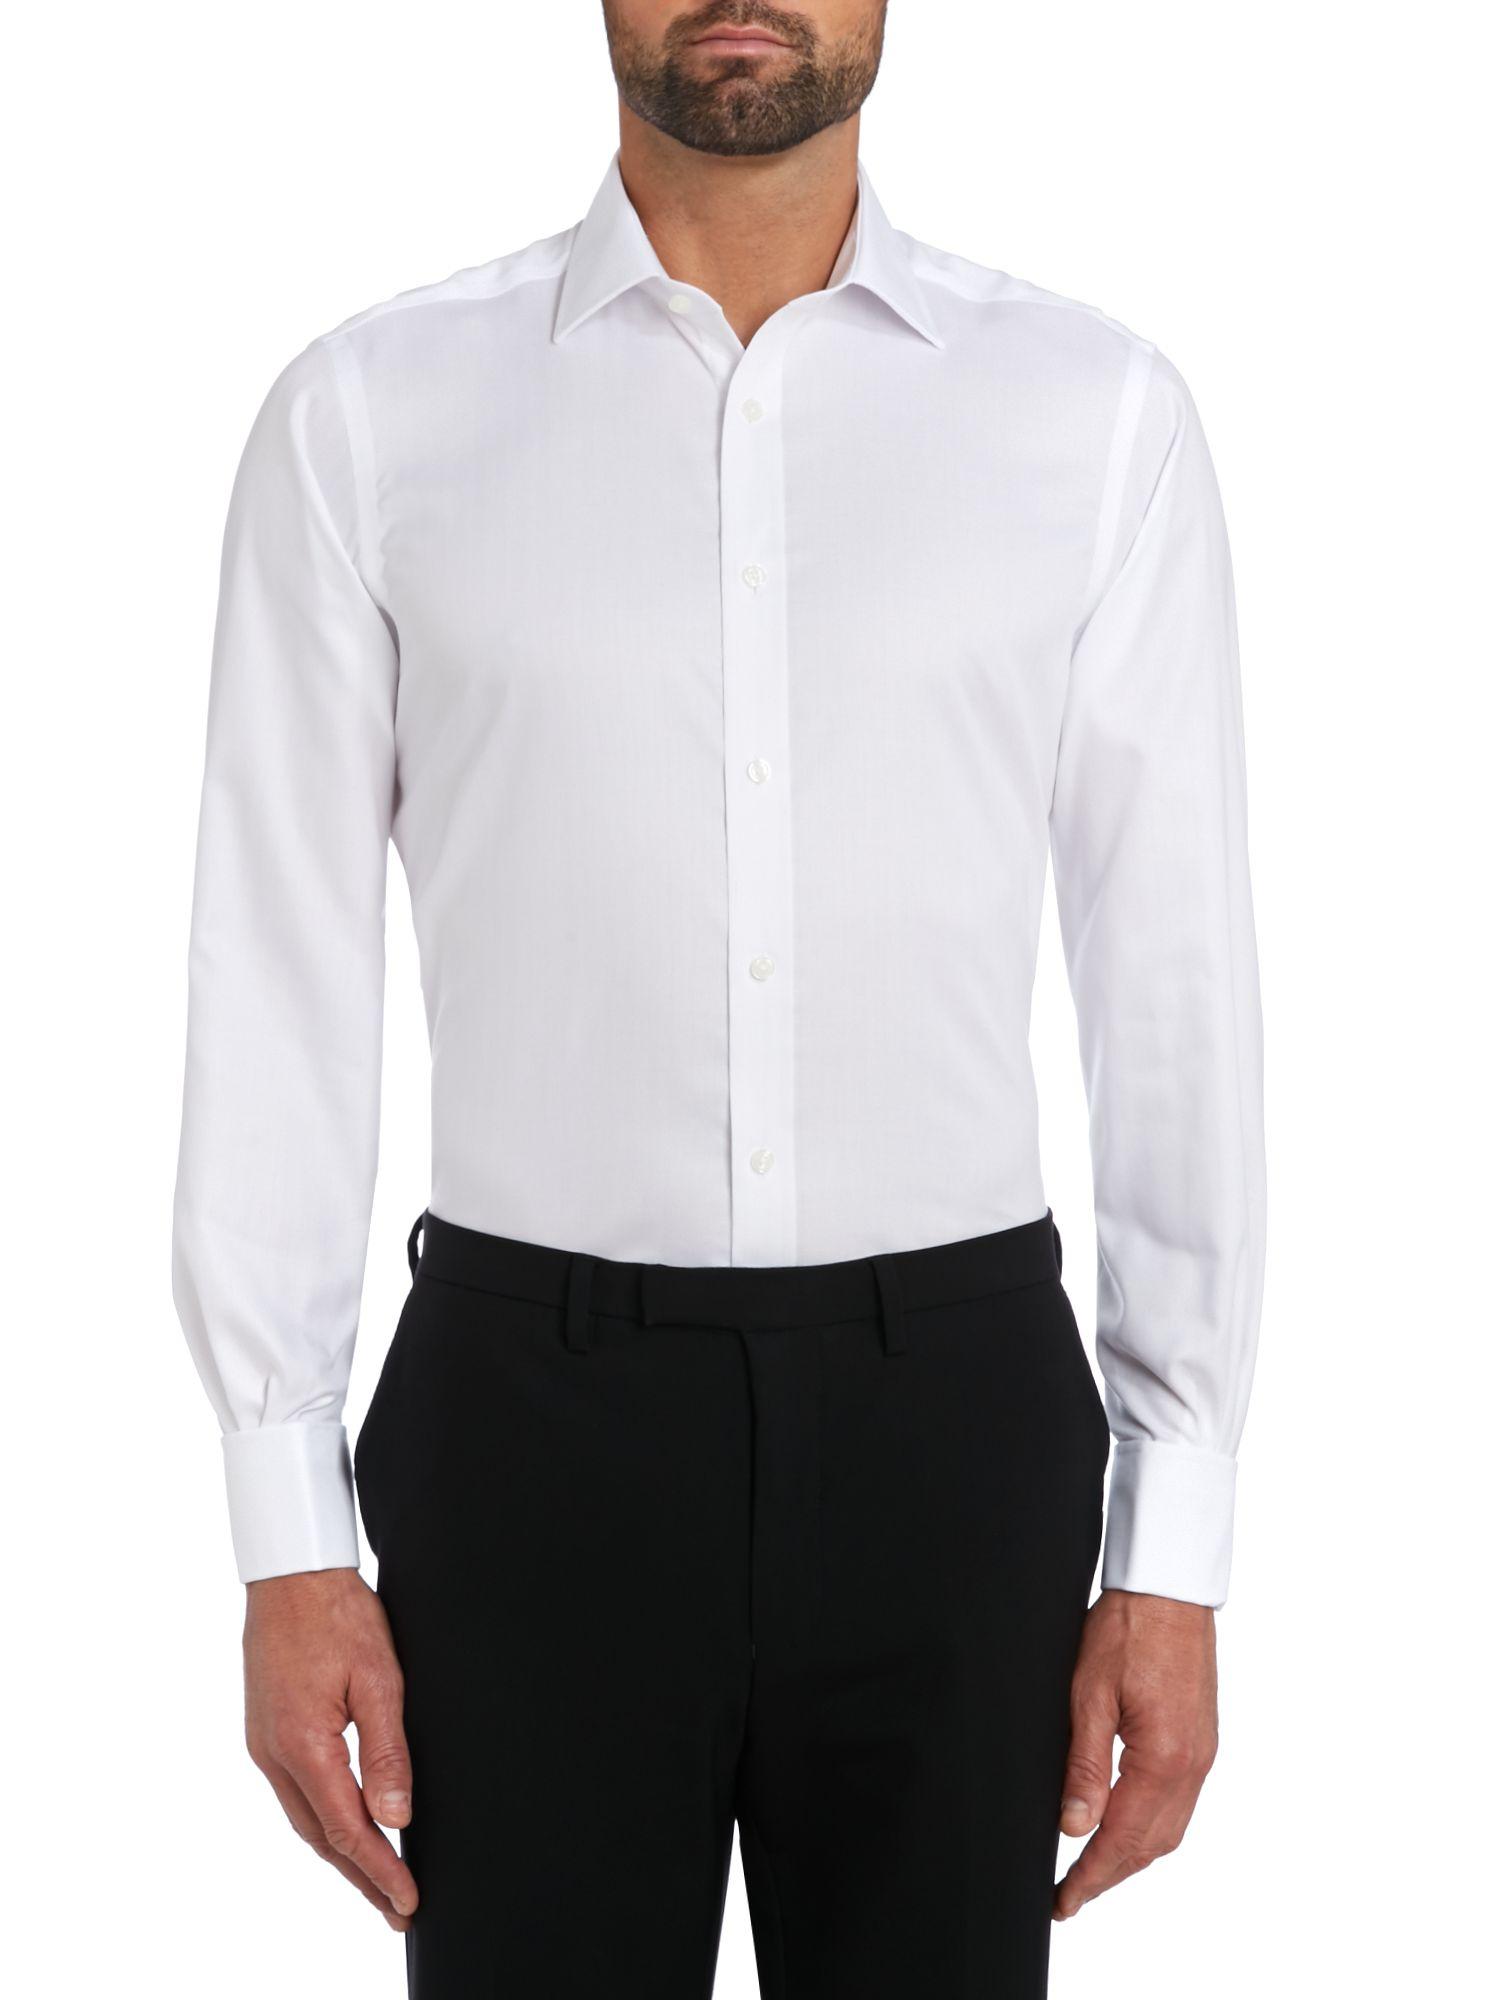 Tm lewin non iron herringbone slim fit formal shirt in for No iron slim fit dress shirts